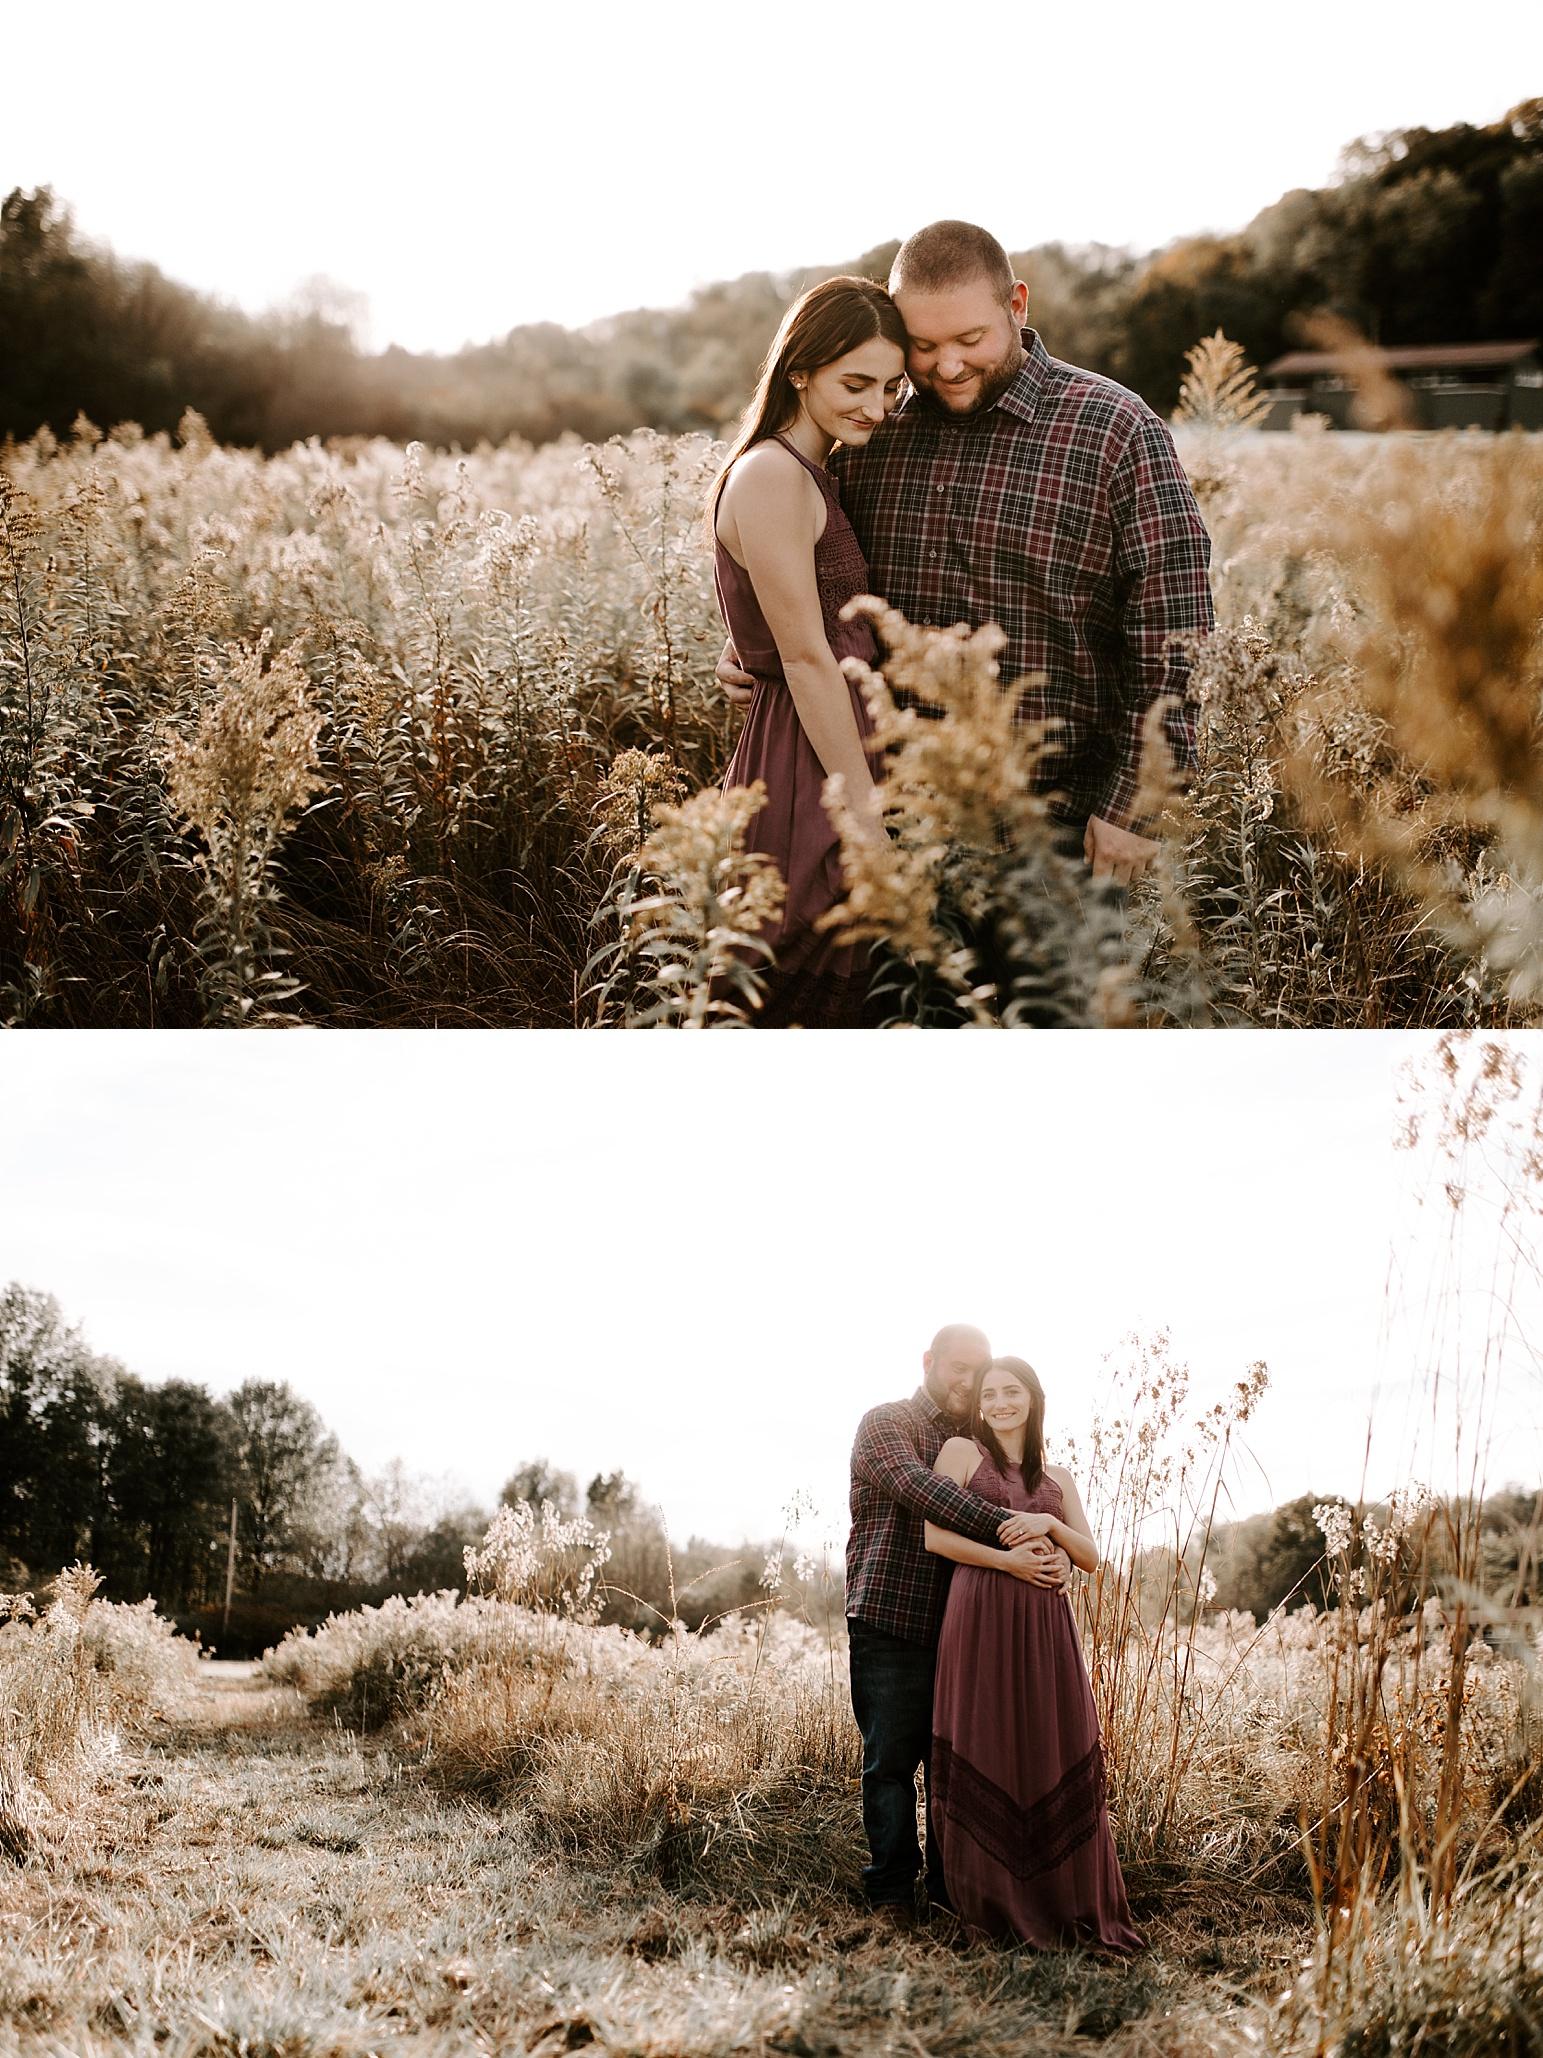 ashley_sara_photography_pittsburgh-wedding-photographer_ohio-wedding-photographer_destination-wedding-photographer10.jpg